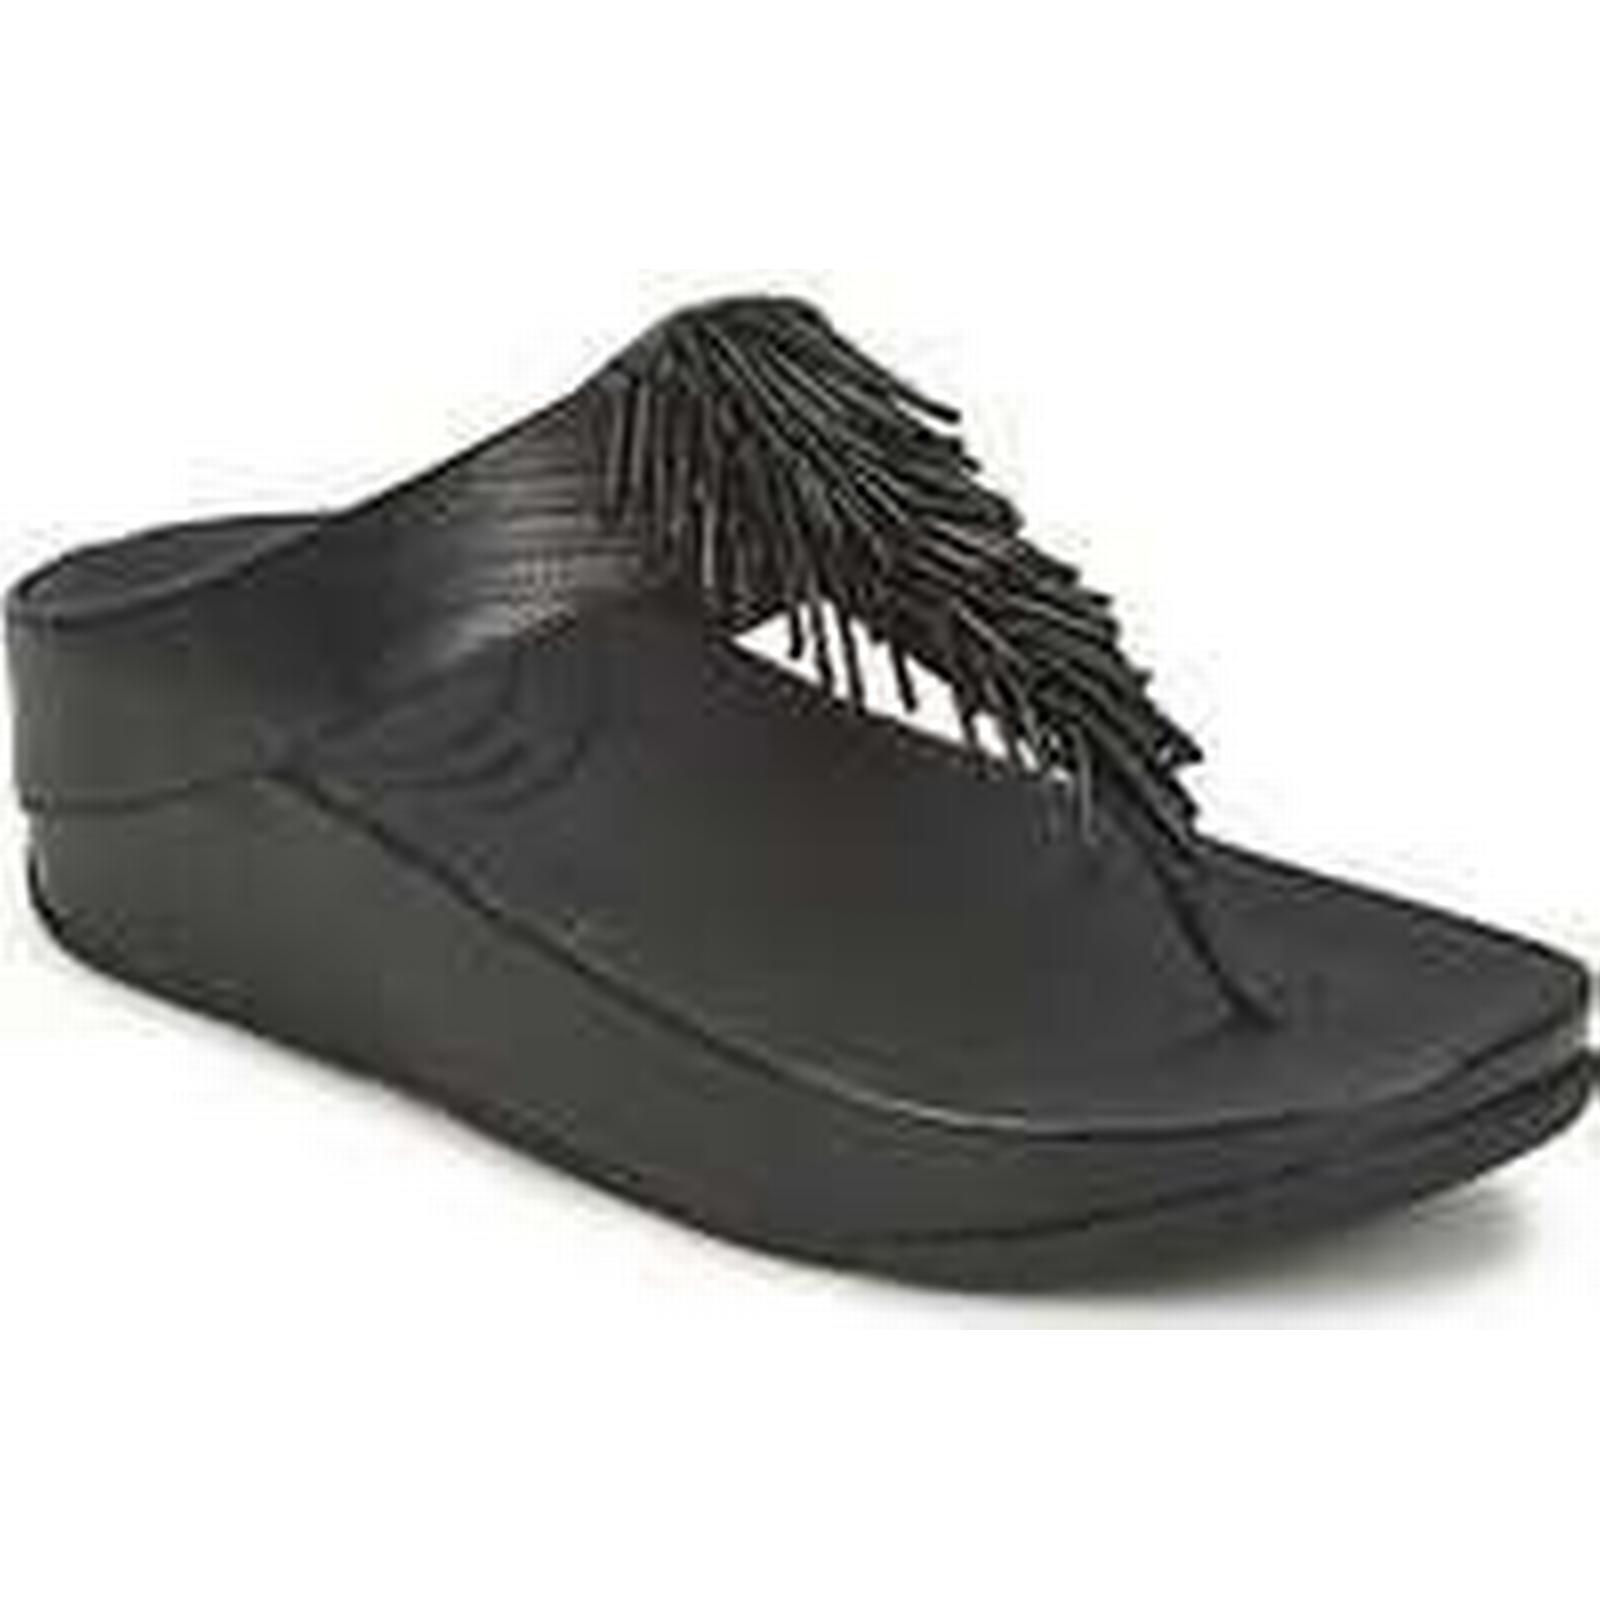 Spartoo.co.uk FitFlop CHA CHA™ women's Flip flops Black / Sandals (Shoes) in Black flops 483f70